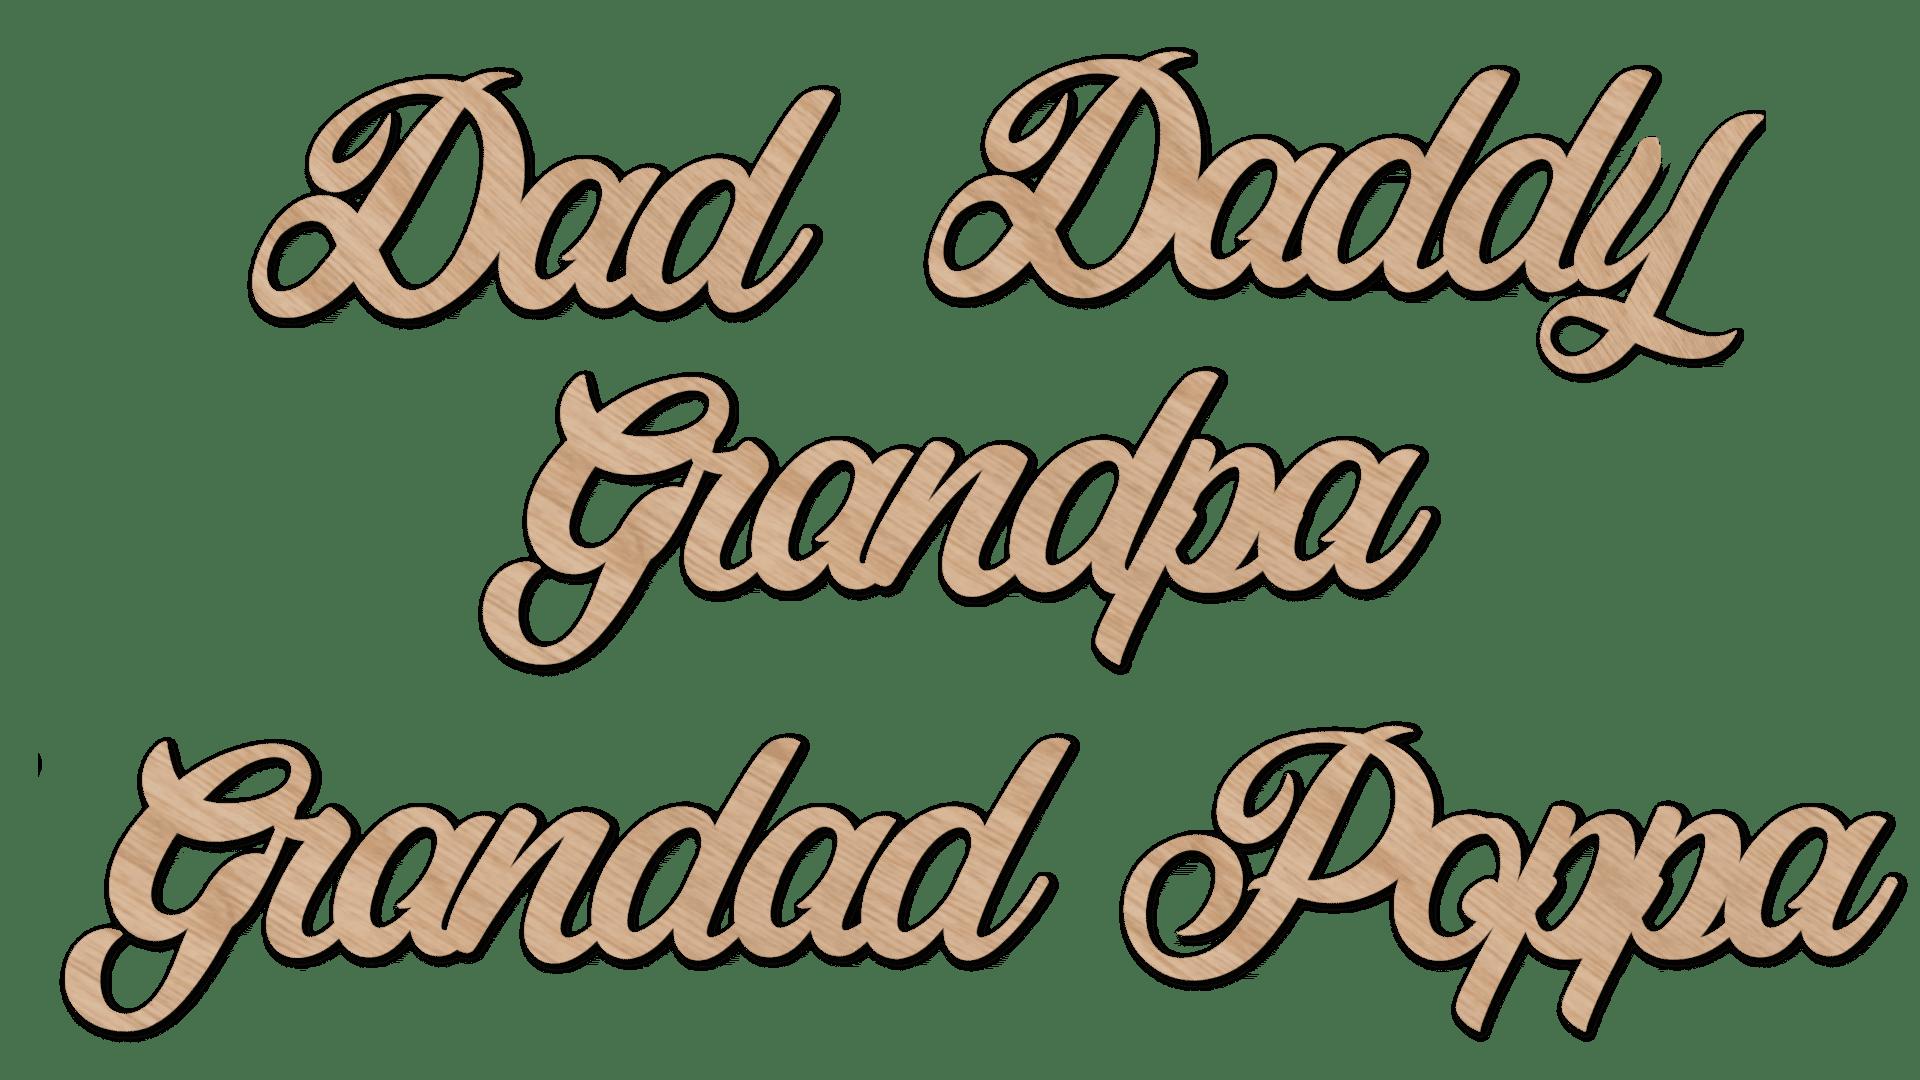 Dad, daddy, grandpa, grandad and poppa